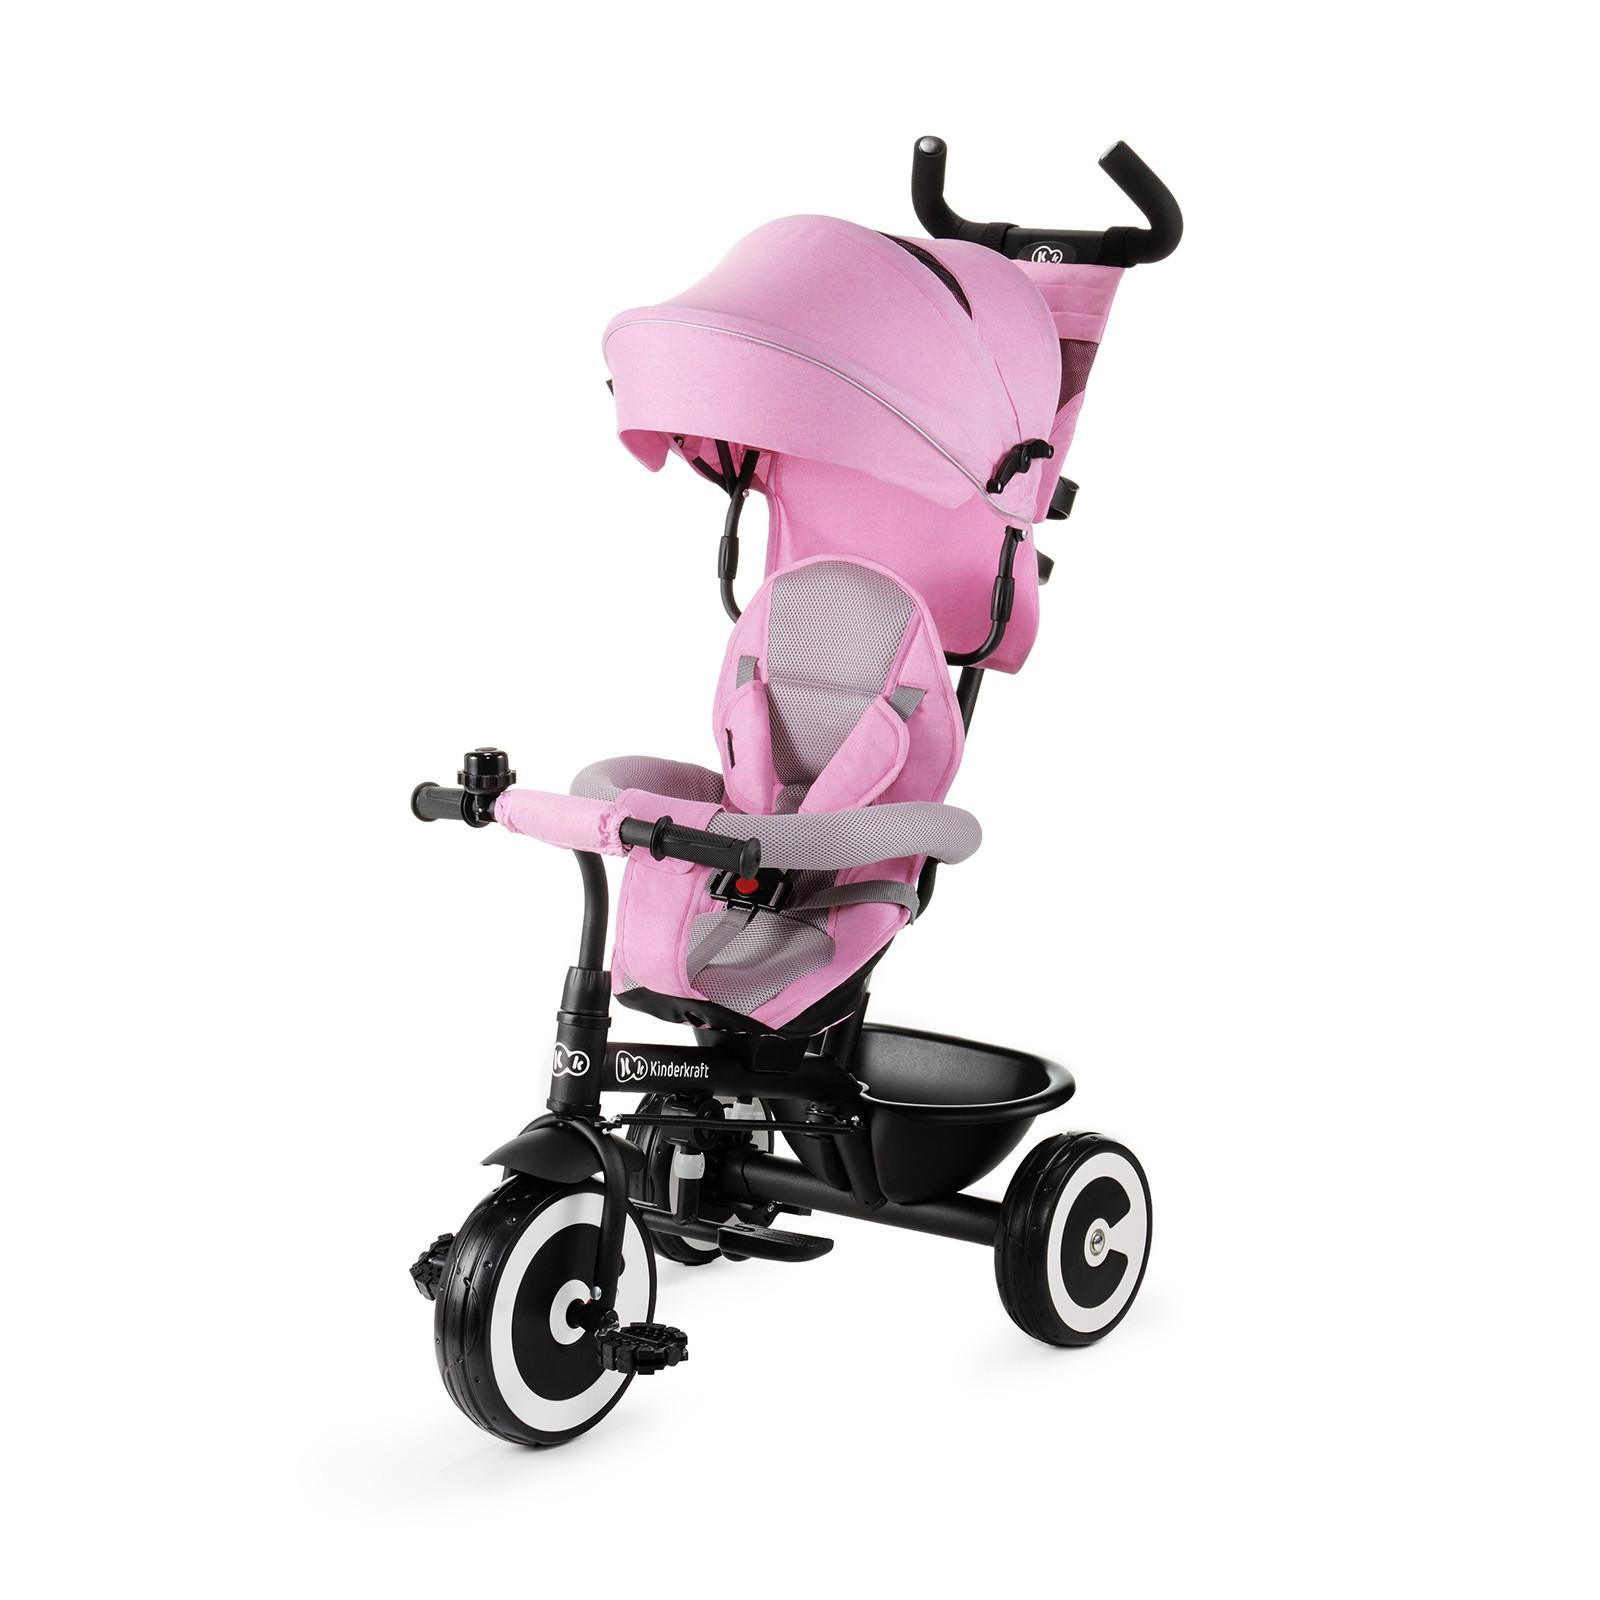 Kinderkraft tricikl guralica ASTON pink